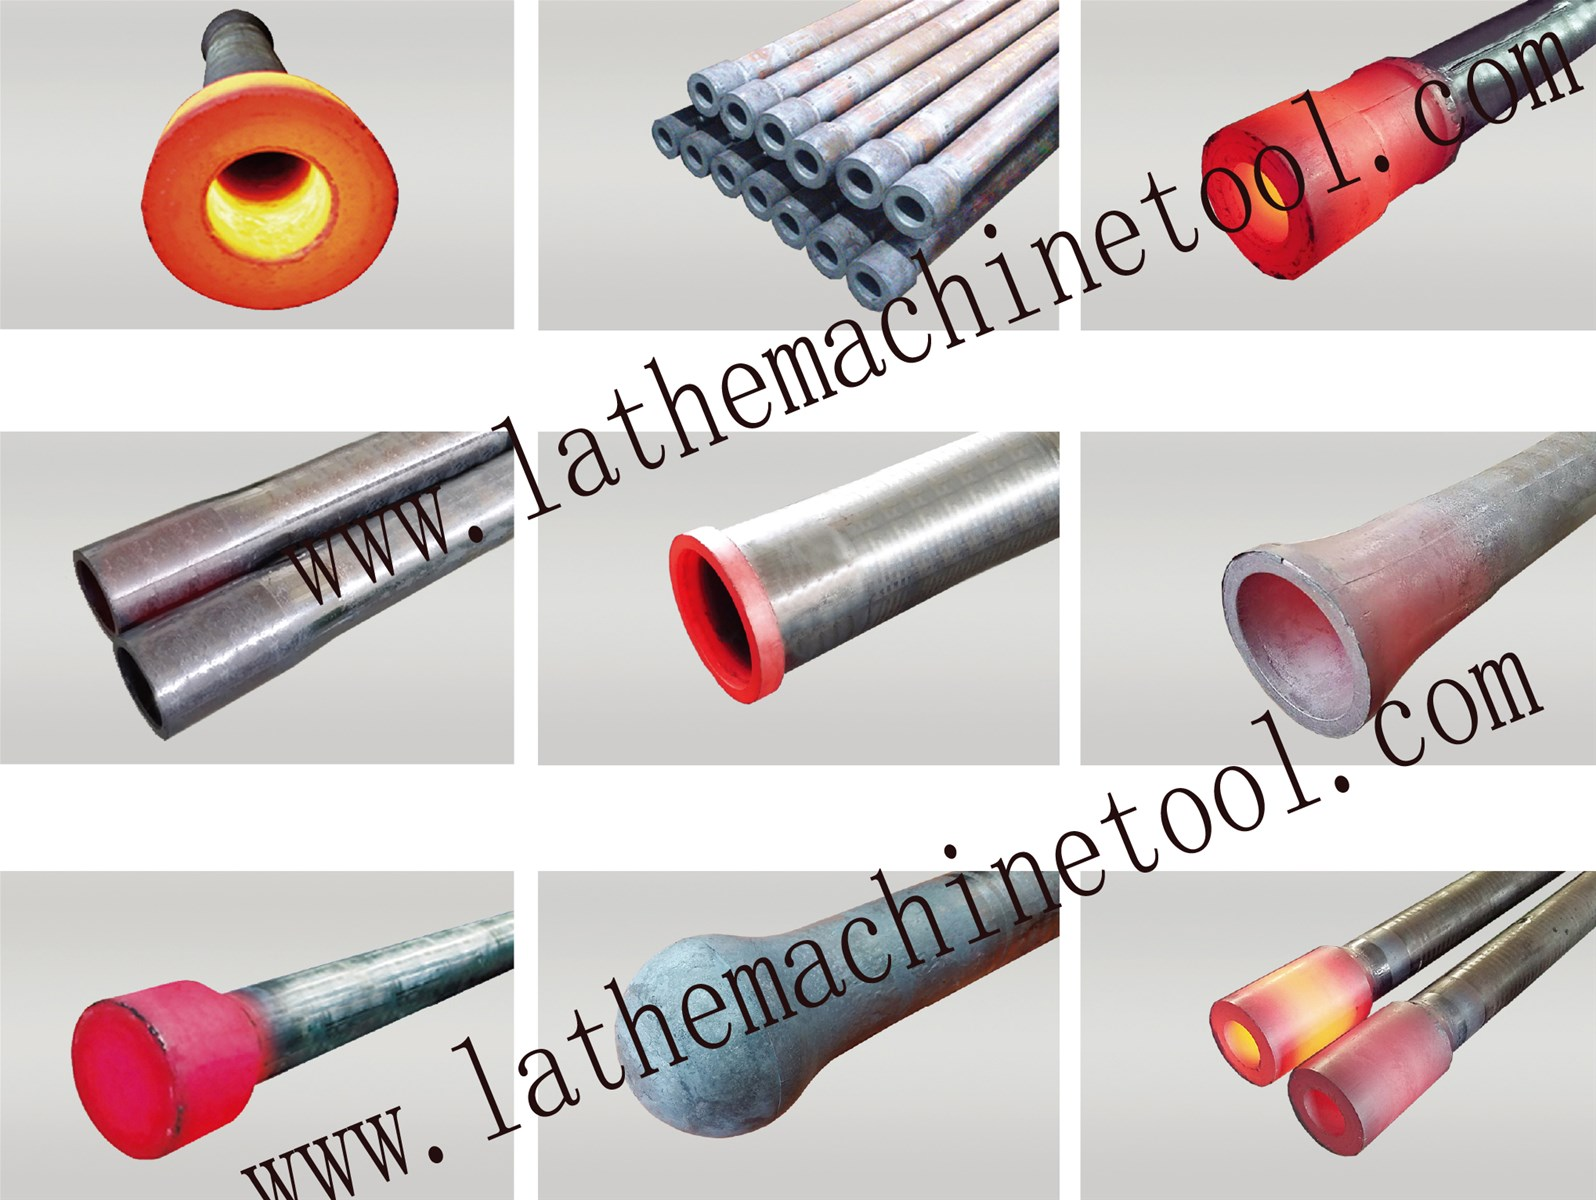 High Precision tubular upsetting press for Upset Forging of drill pipe